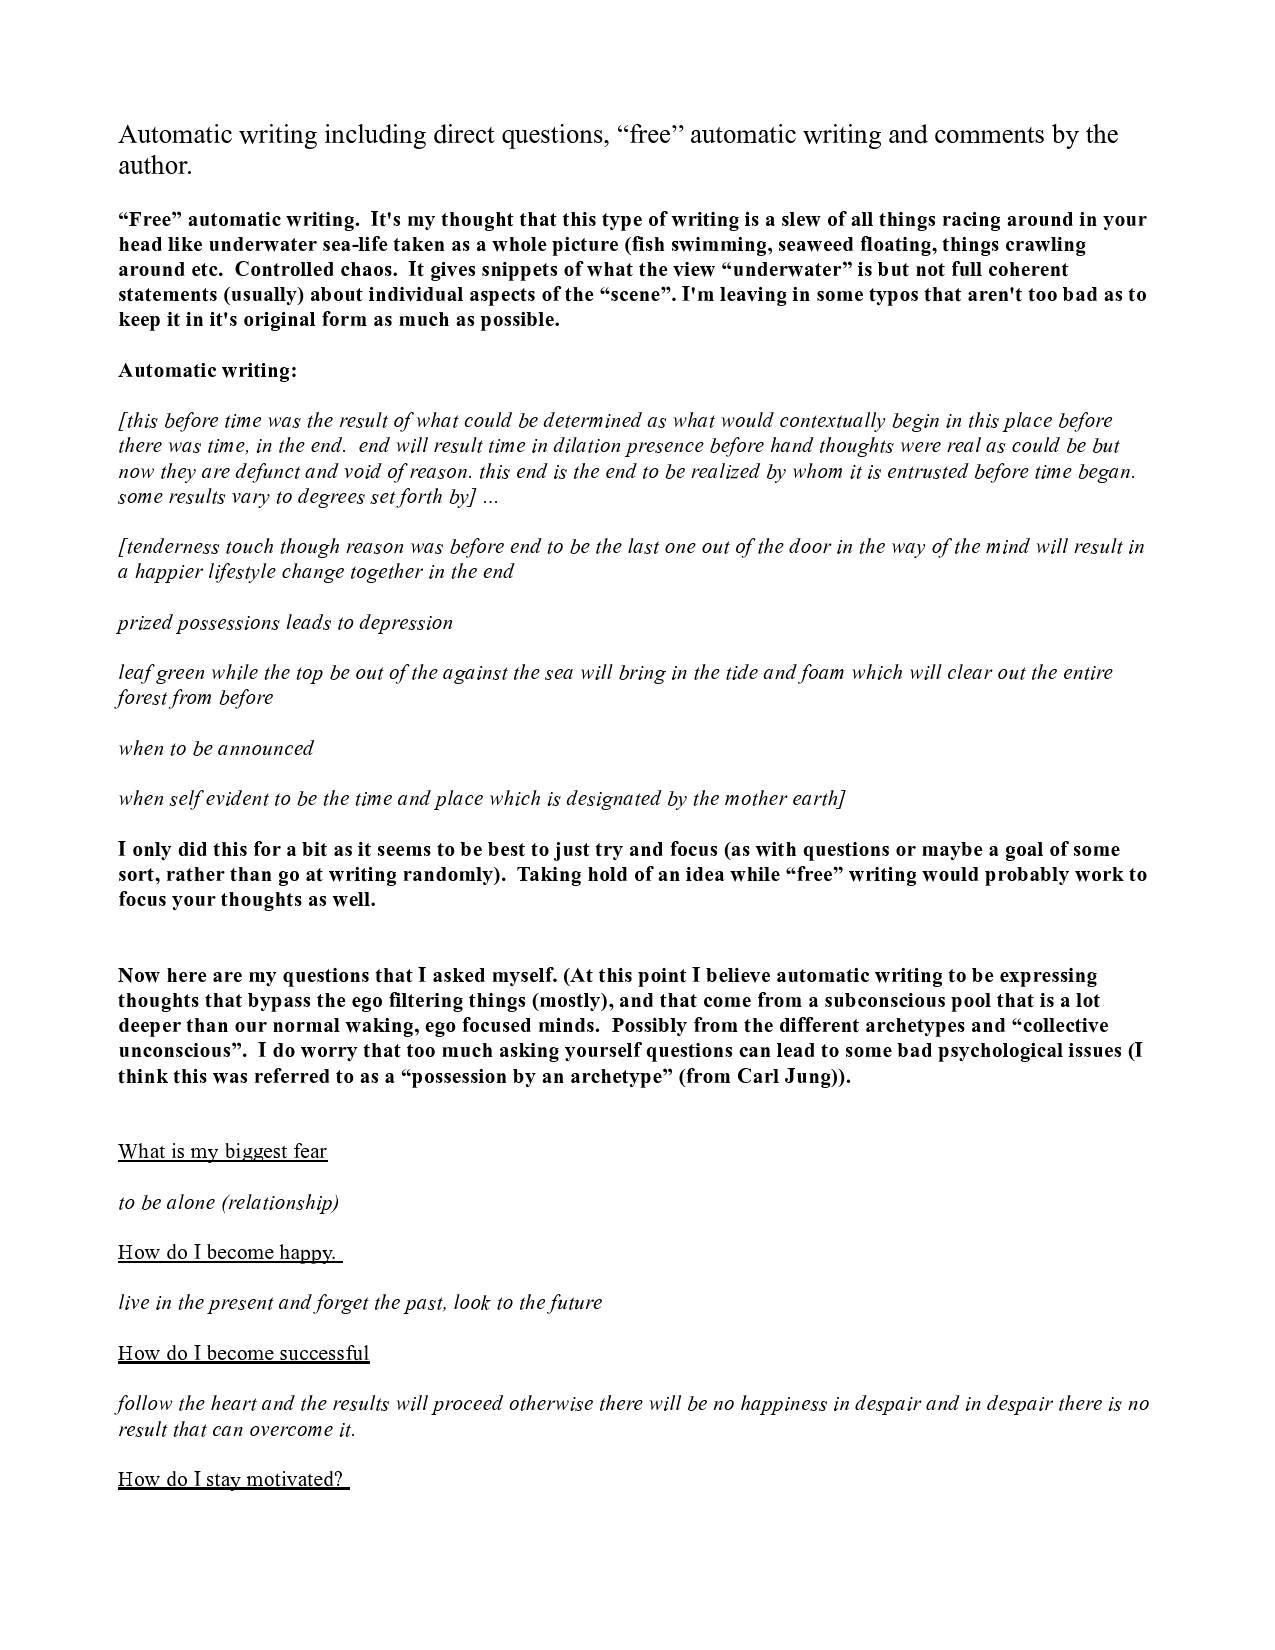 Discursive essay plan int 20